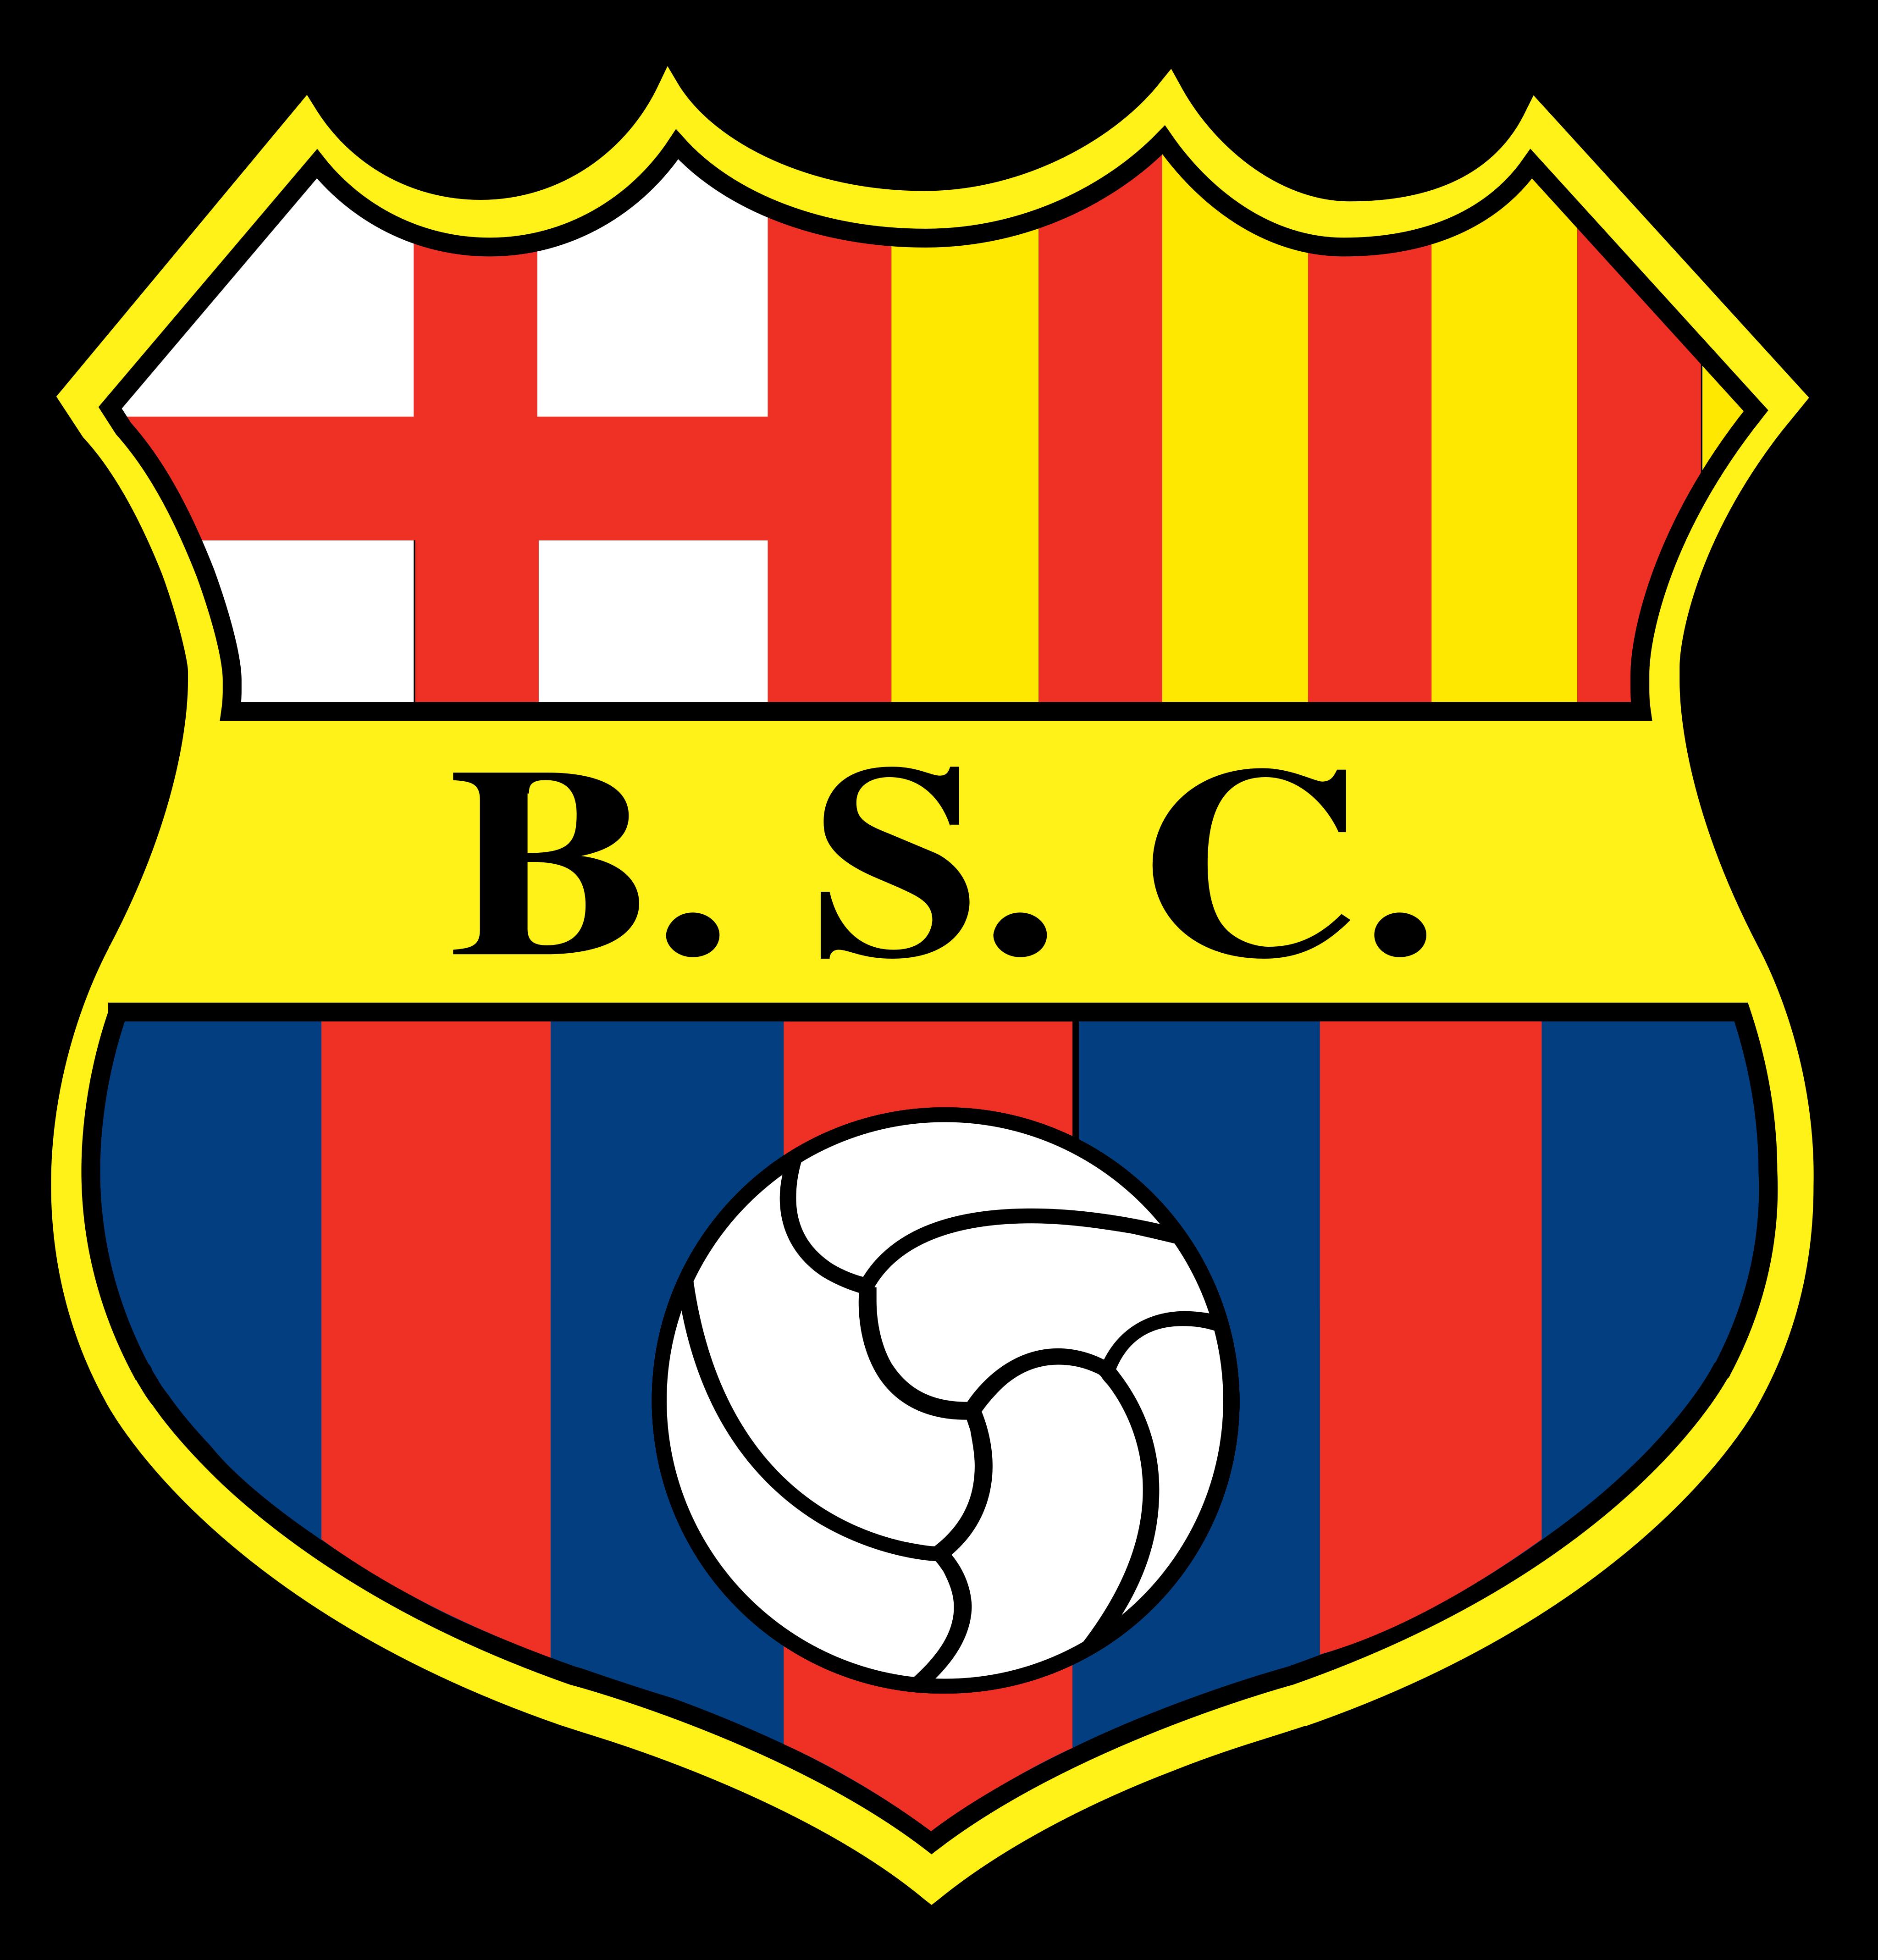 barcelona sc logo 6 - Barcelona SC Guayaquil Logo